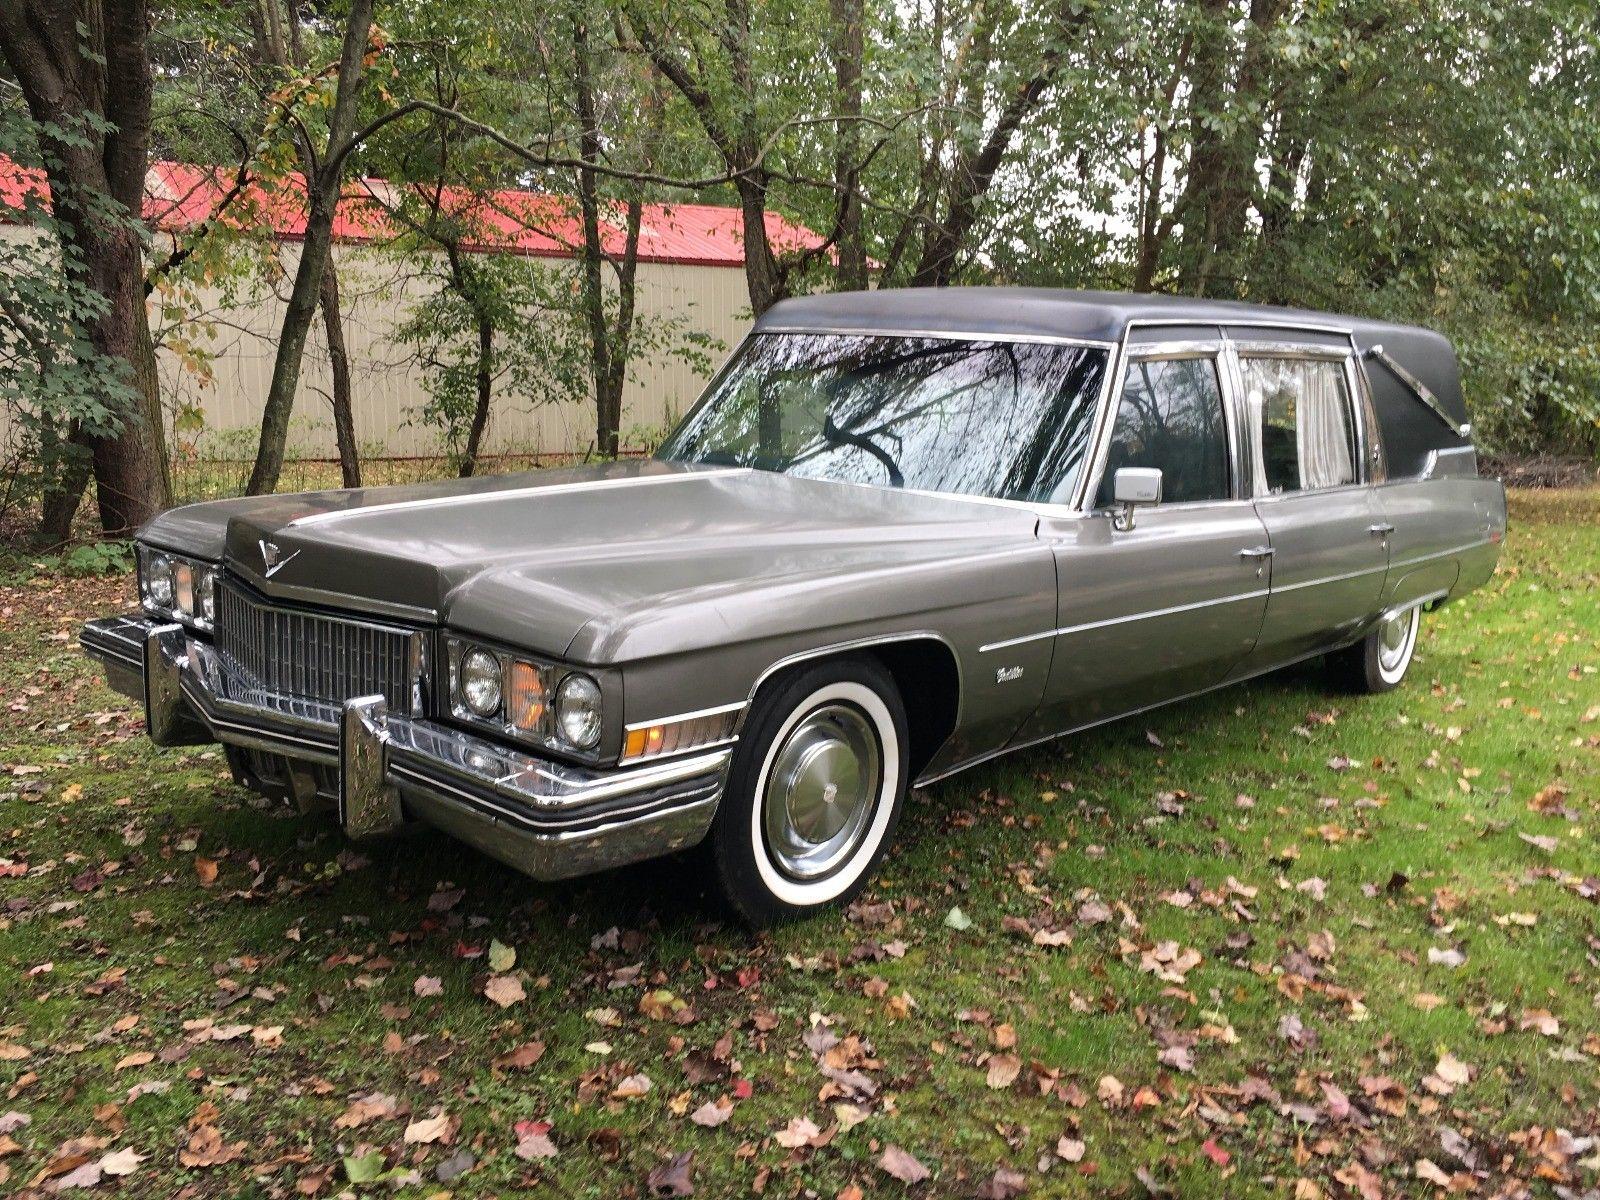 minor damage 1973 Cadillac Superior Hearse for sale